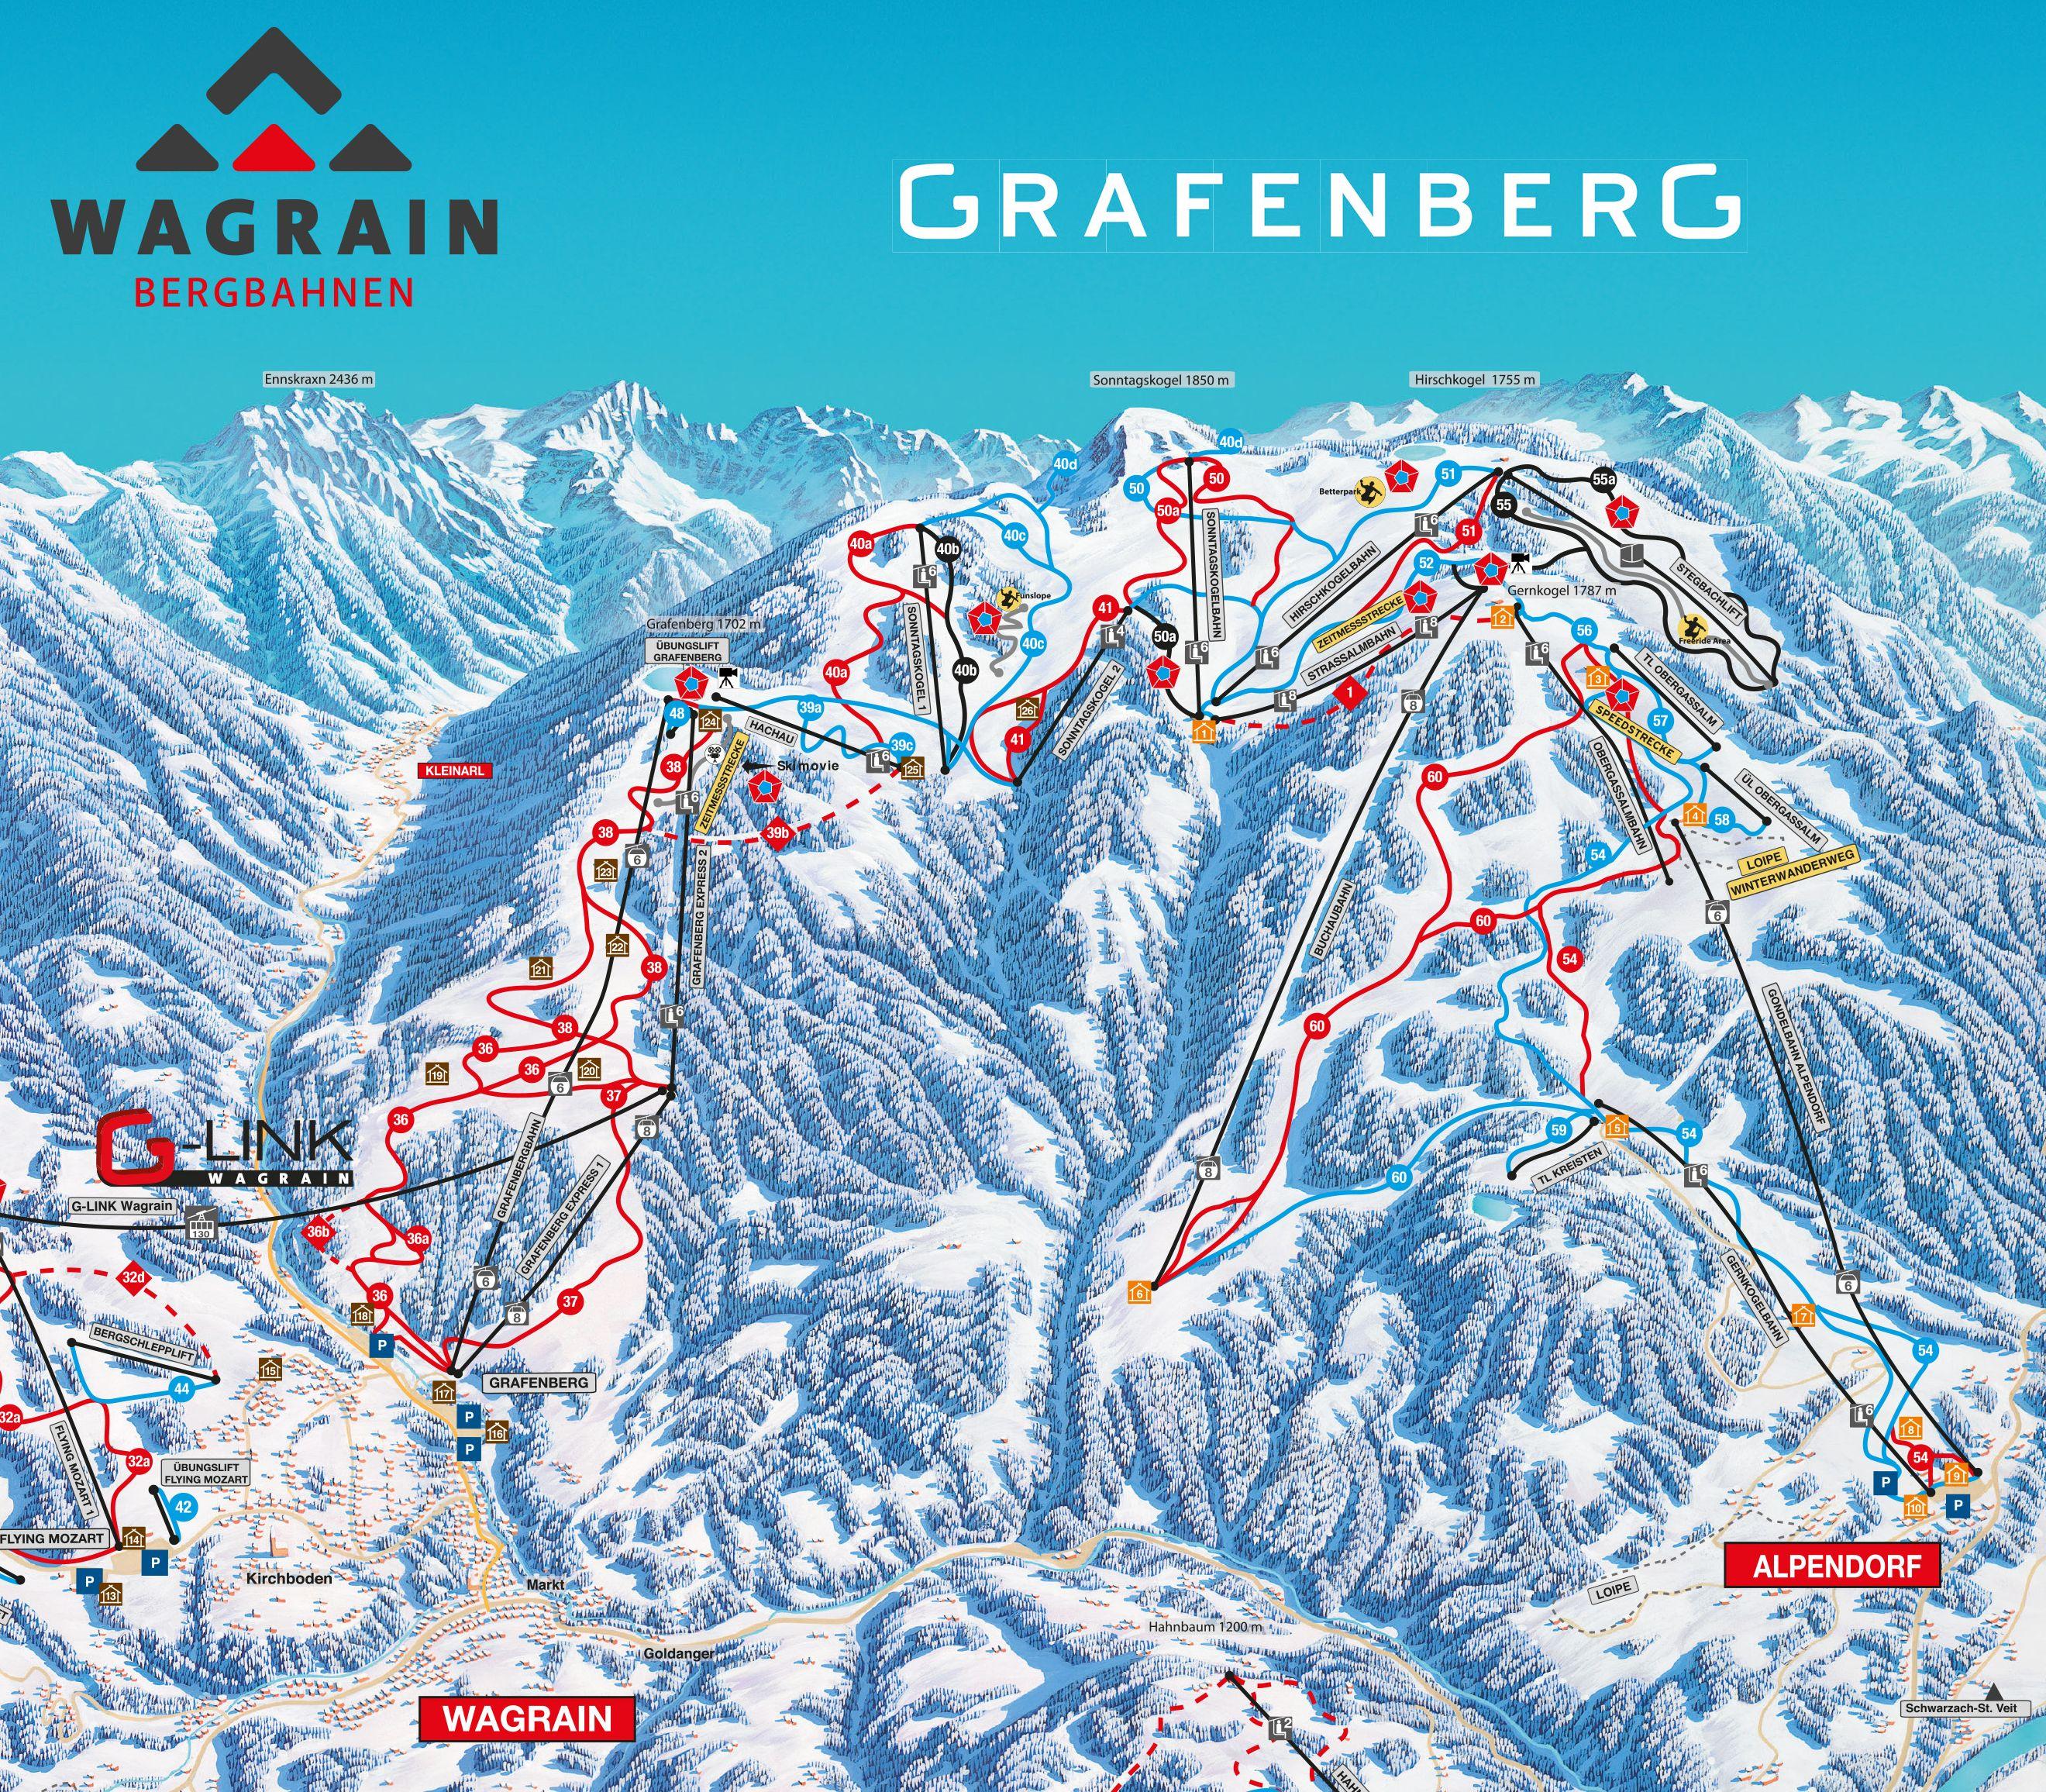 Lyžařská mapa sjezdovek areálu Wagrain / Grafenberg - Alpendorf (St. Johann)